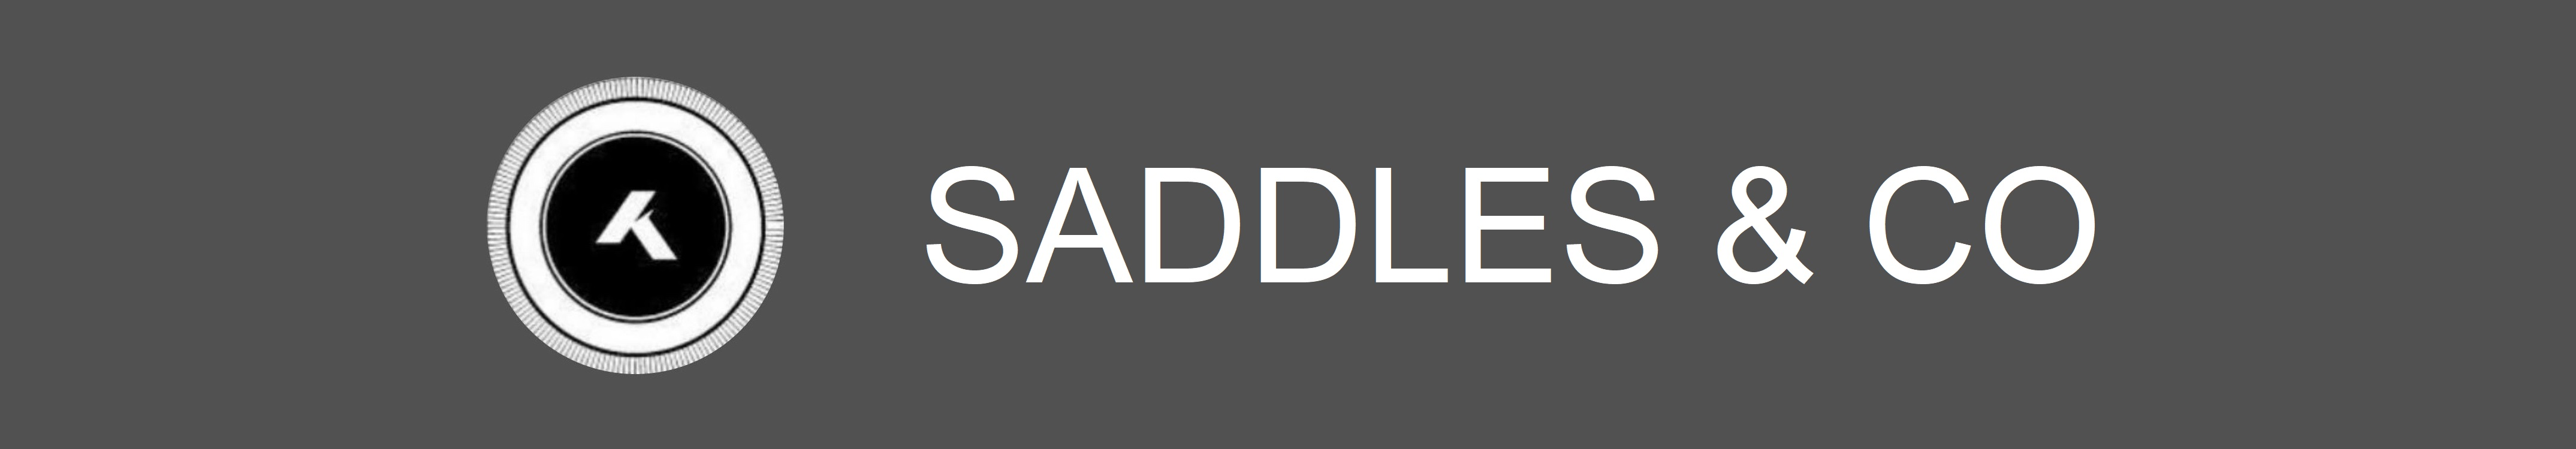 Saddles-Co